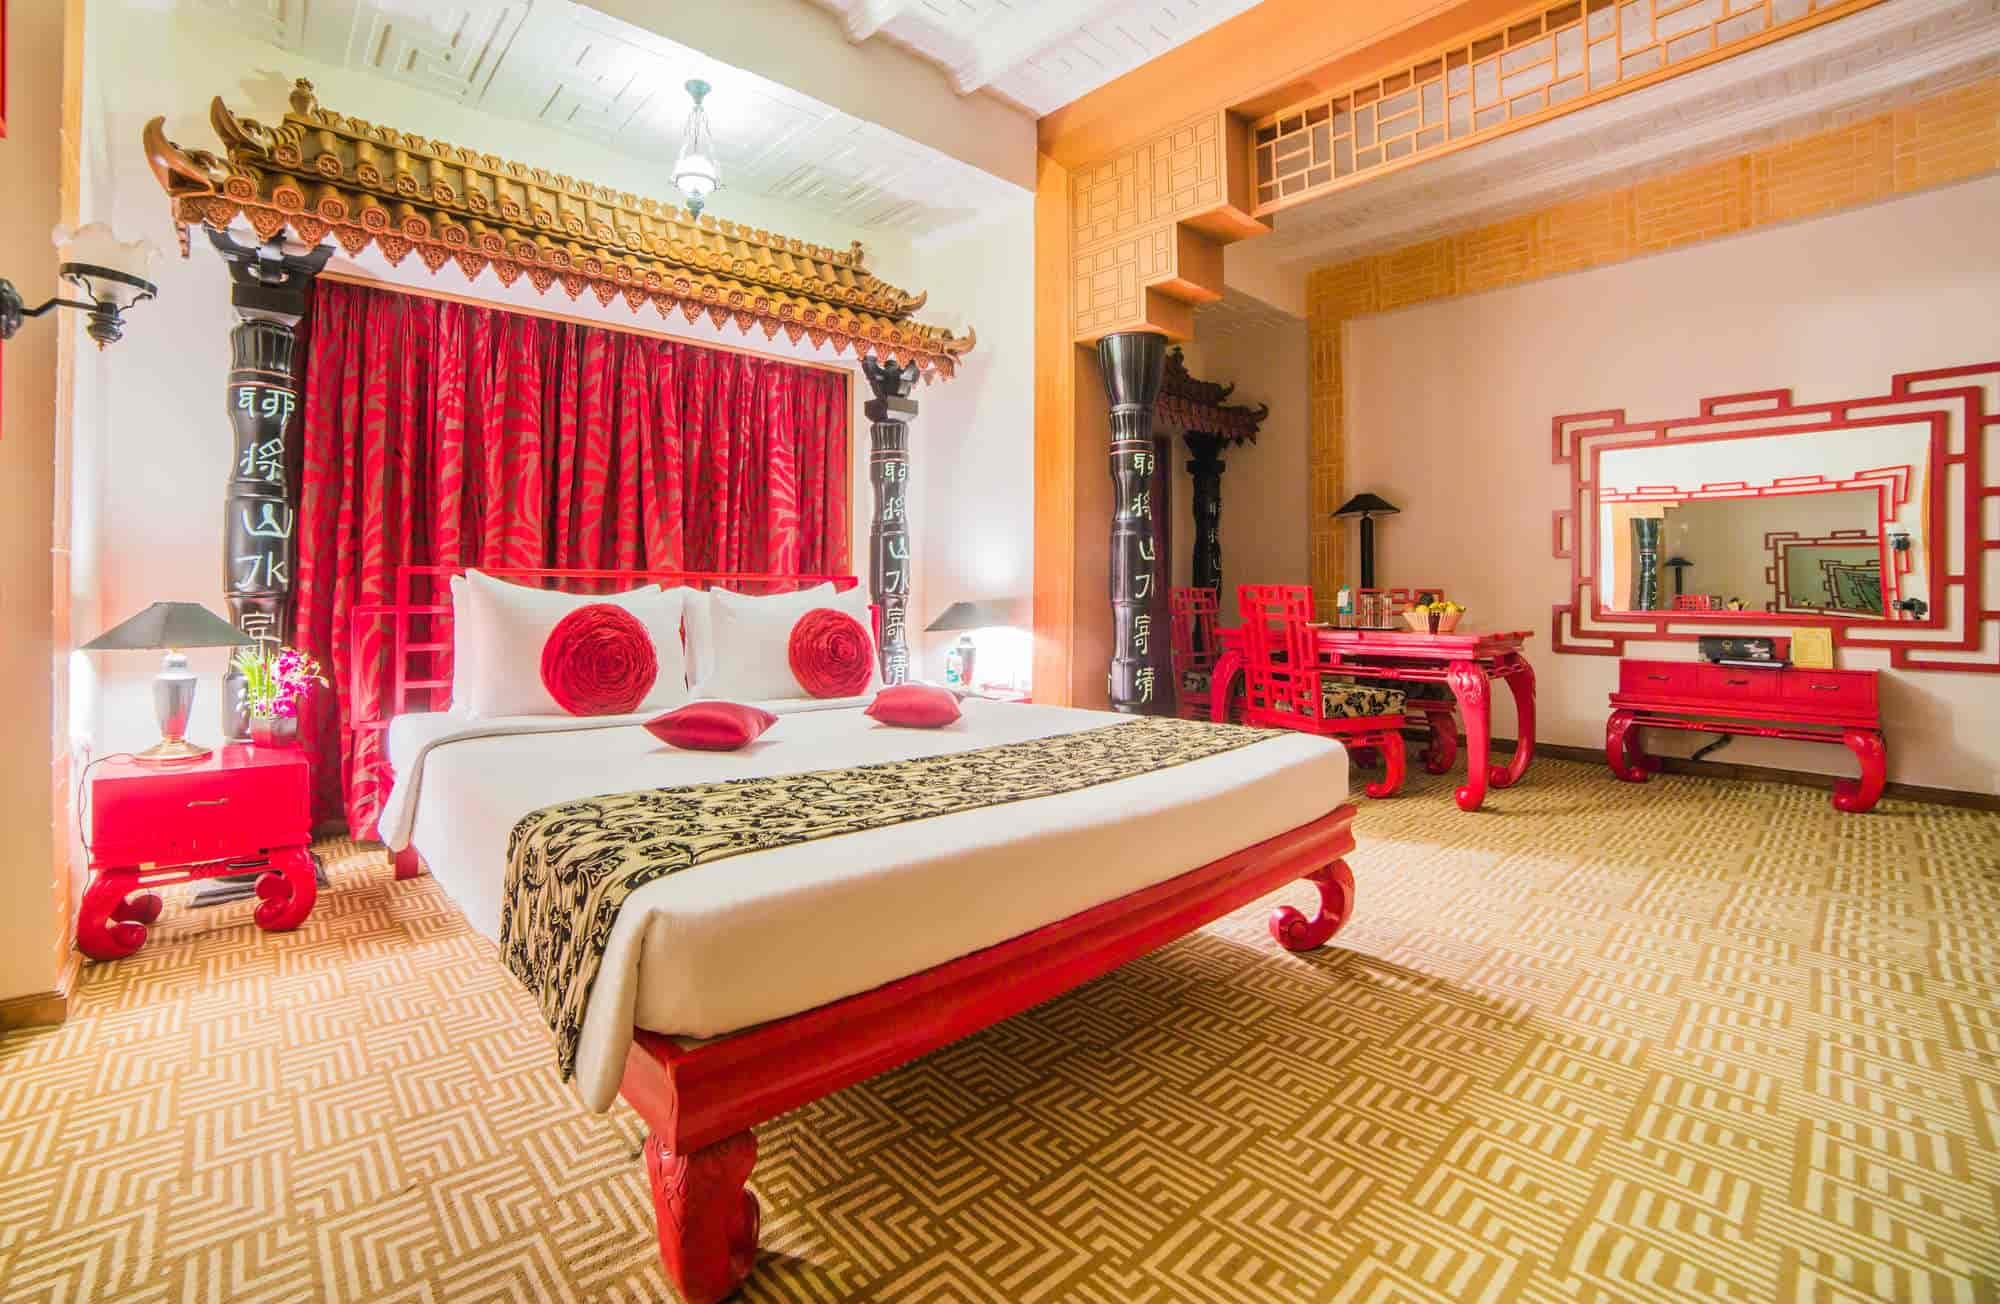 Sitara Luxury Hotel, Ramoji Film City - 4 Star Hotels in